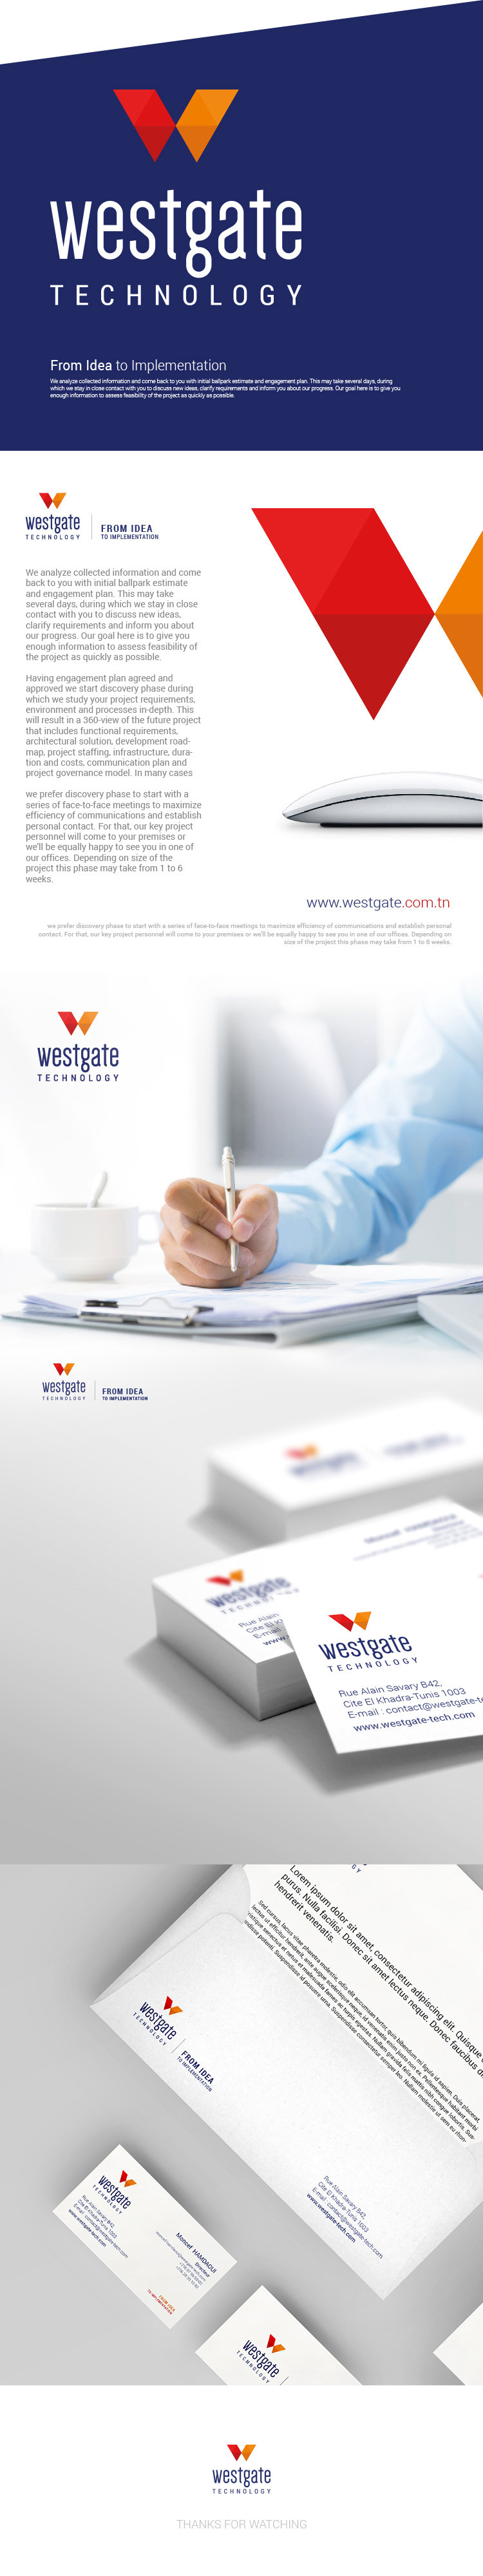 logotype westgate technology